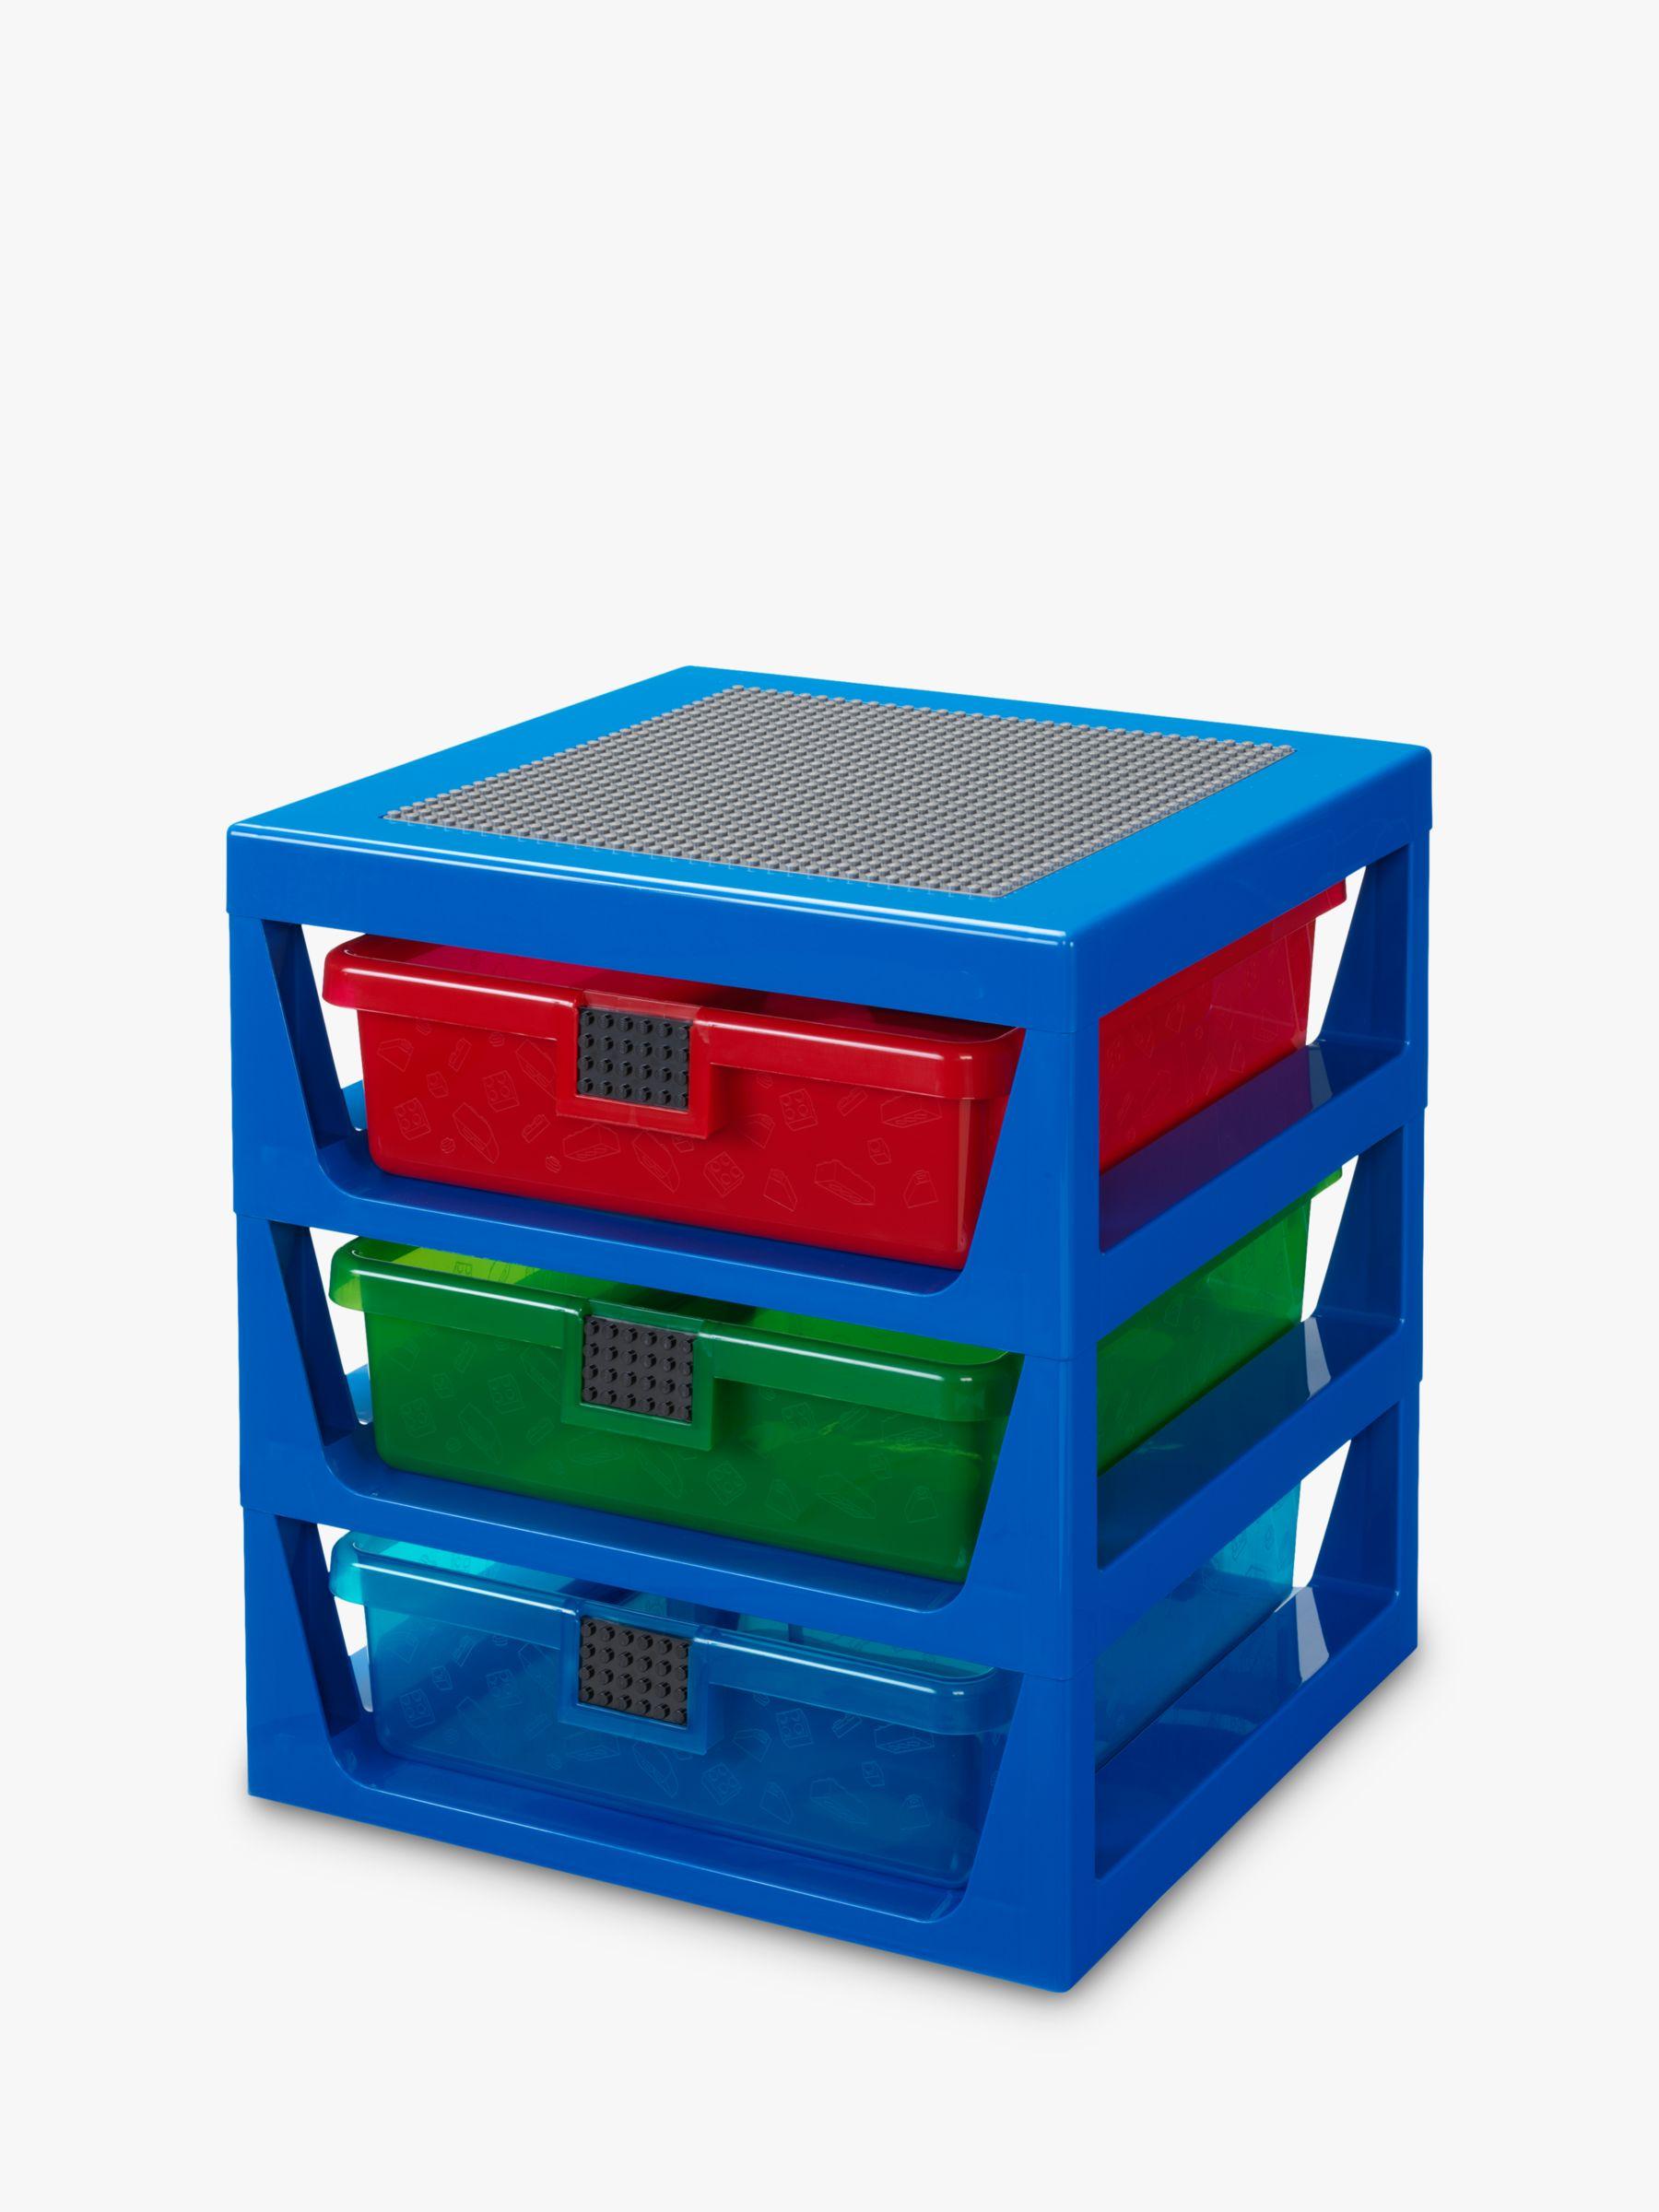 LEGO 3-Drawer Storage Rack System in Blue